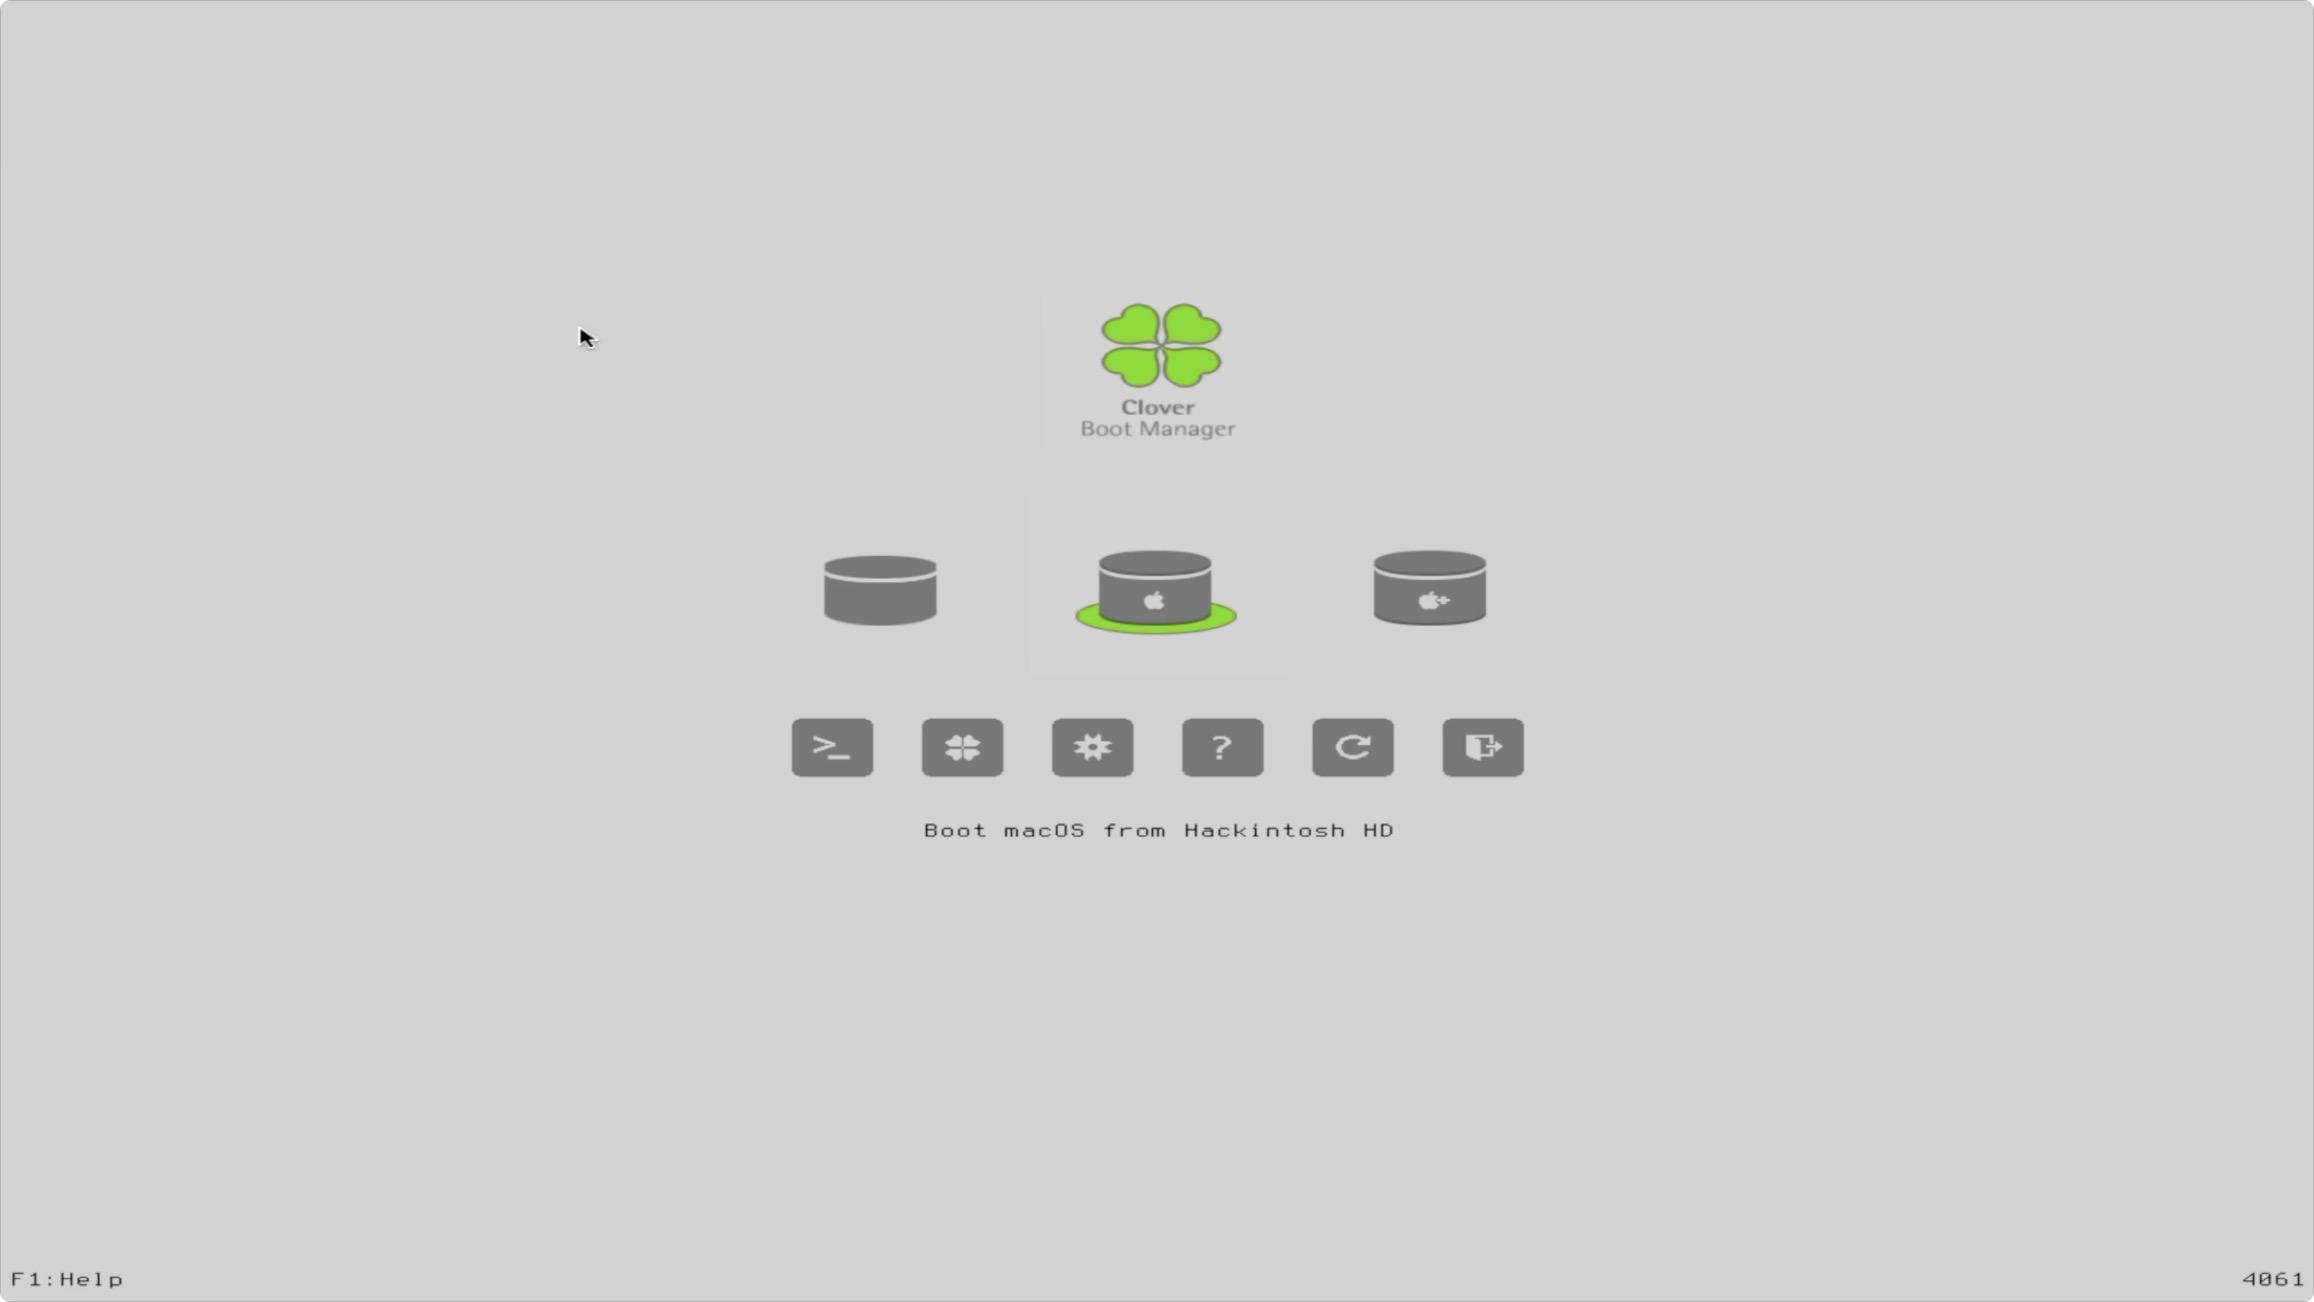 Building a GTX 1080 Ti-powered Hackintosh: Installing macOS Sierra